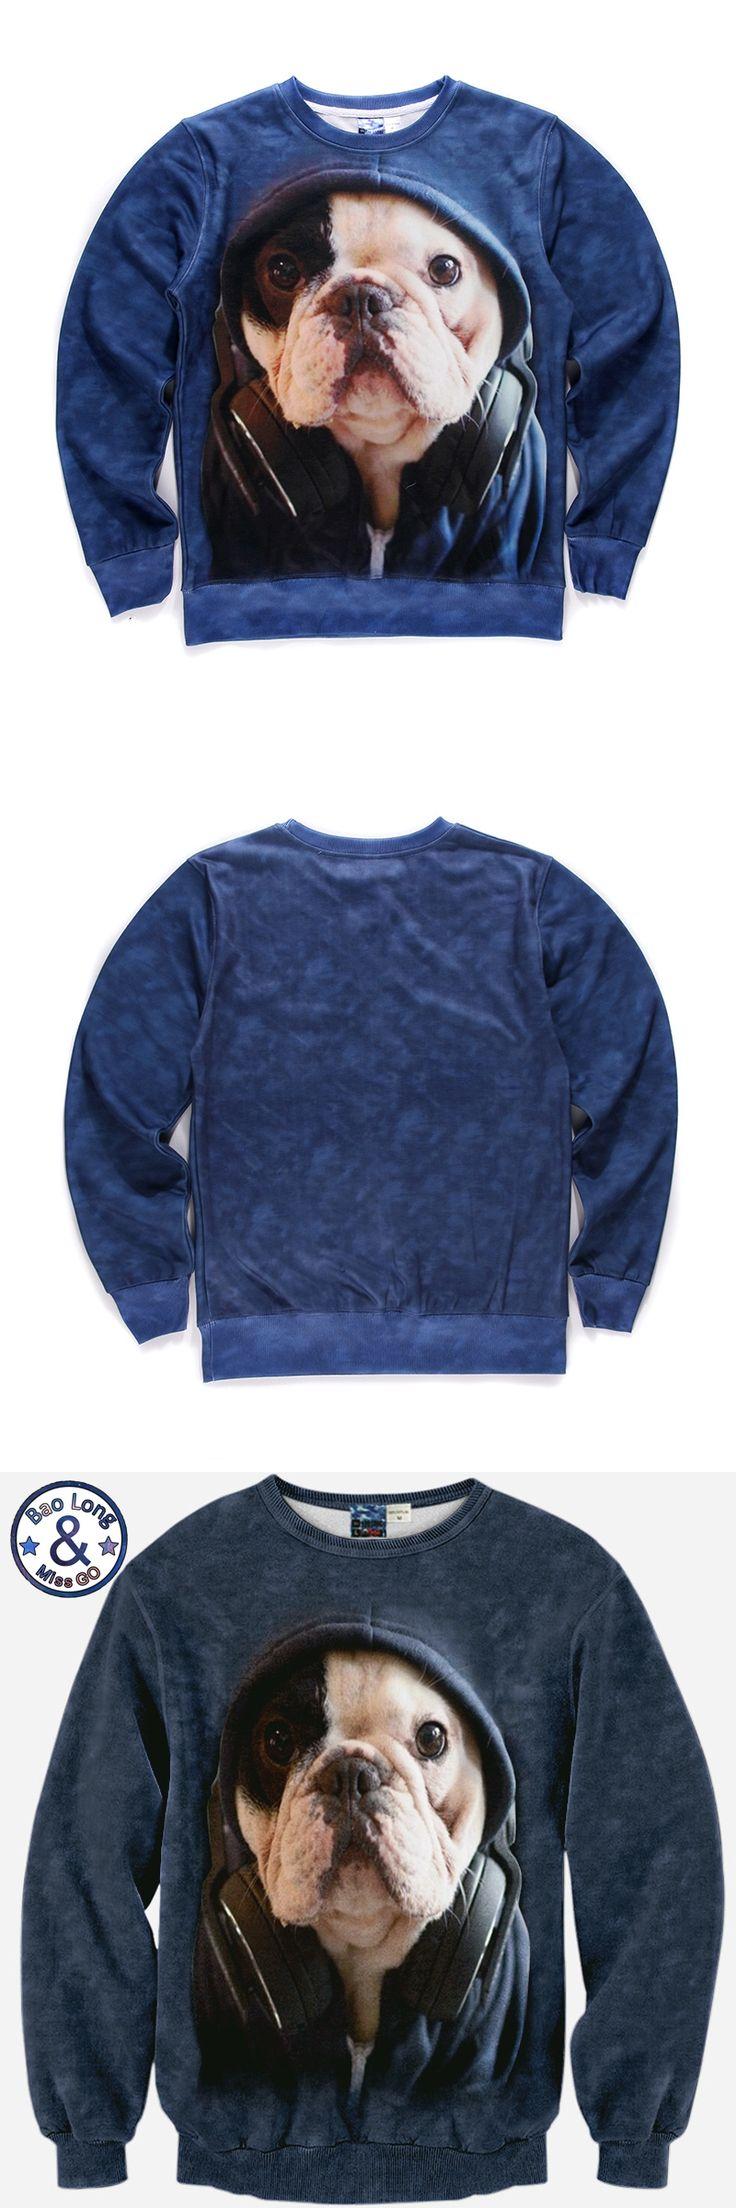 Mr.BaoLong New Autumn Winter Men/Women Sweatshirt Long Sleeve Fleece 3d Dog Print Hoodies Harajuku WH50 S-XL